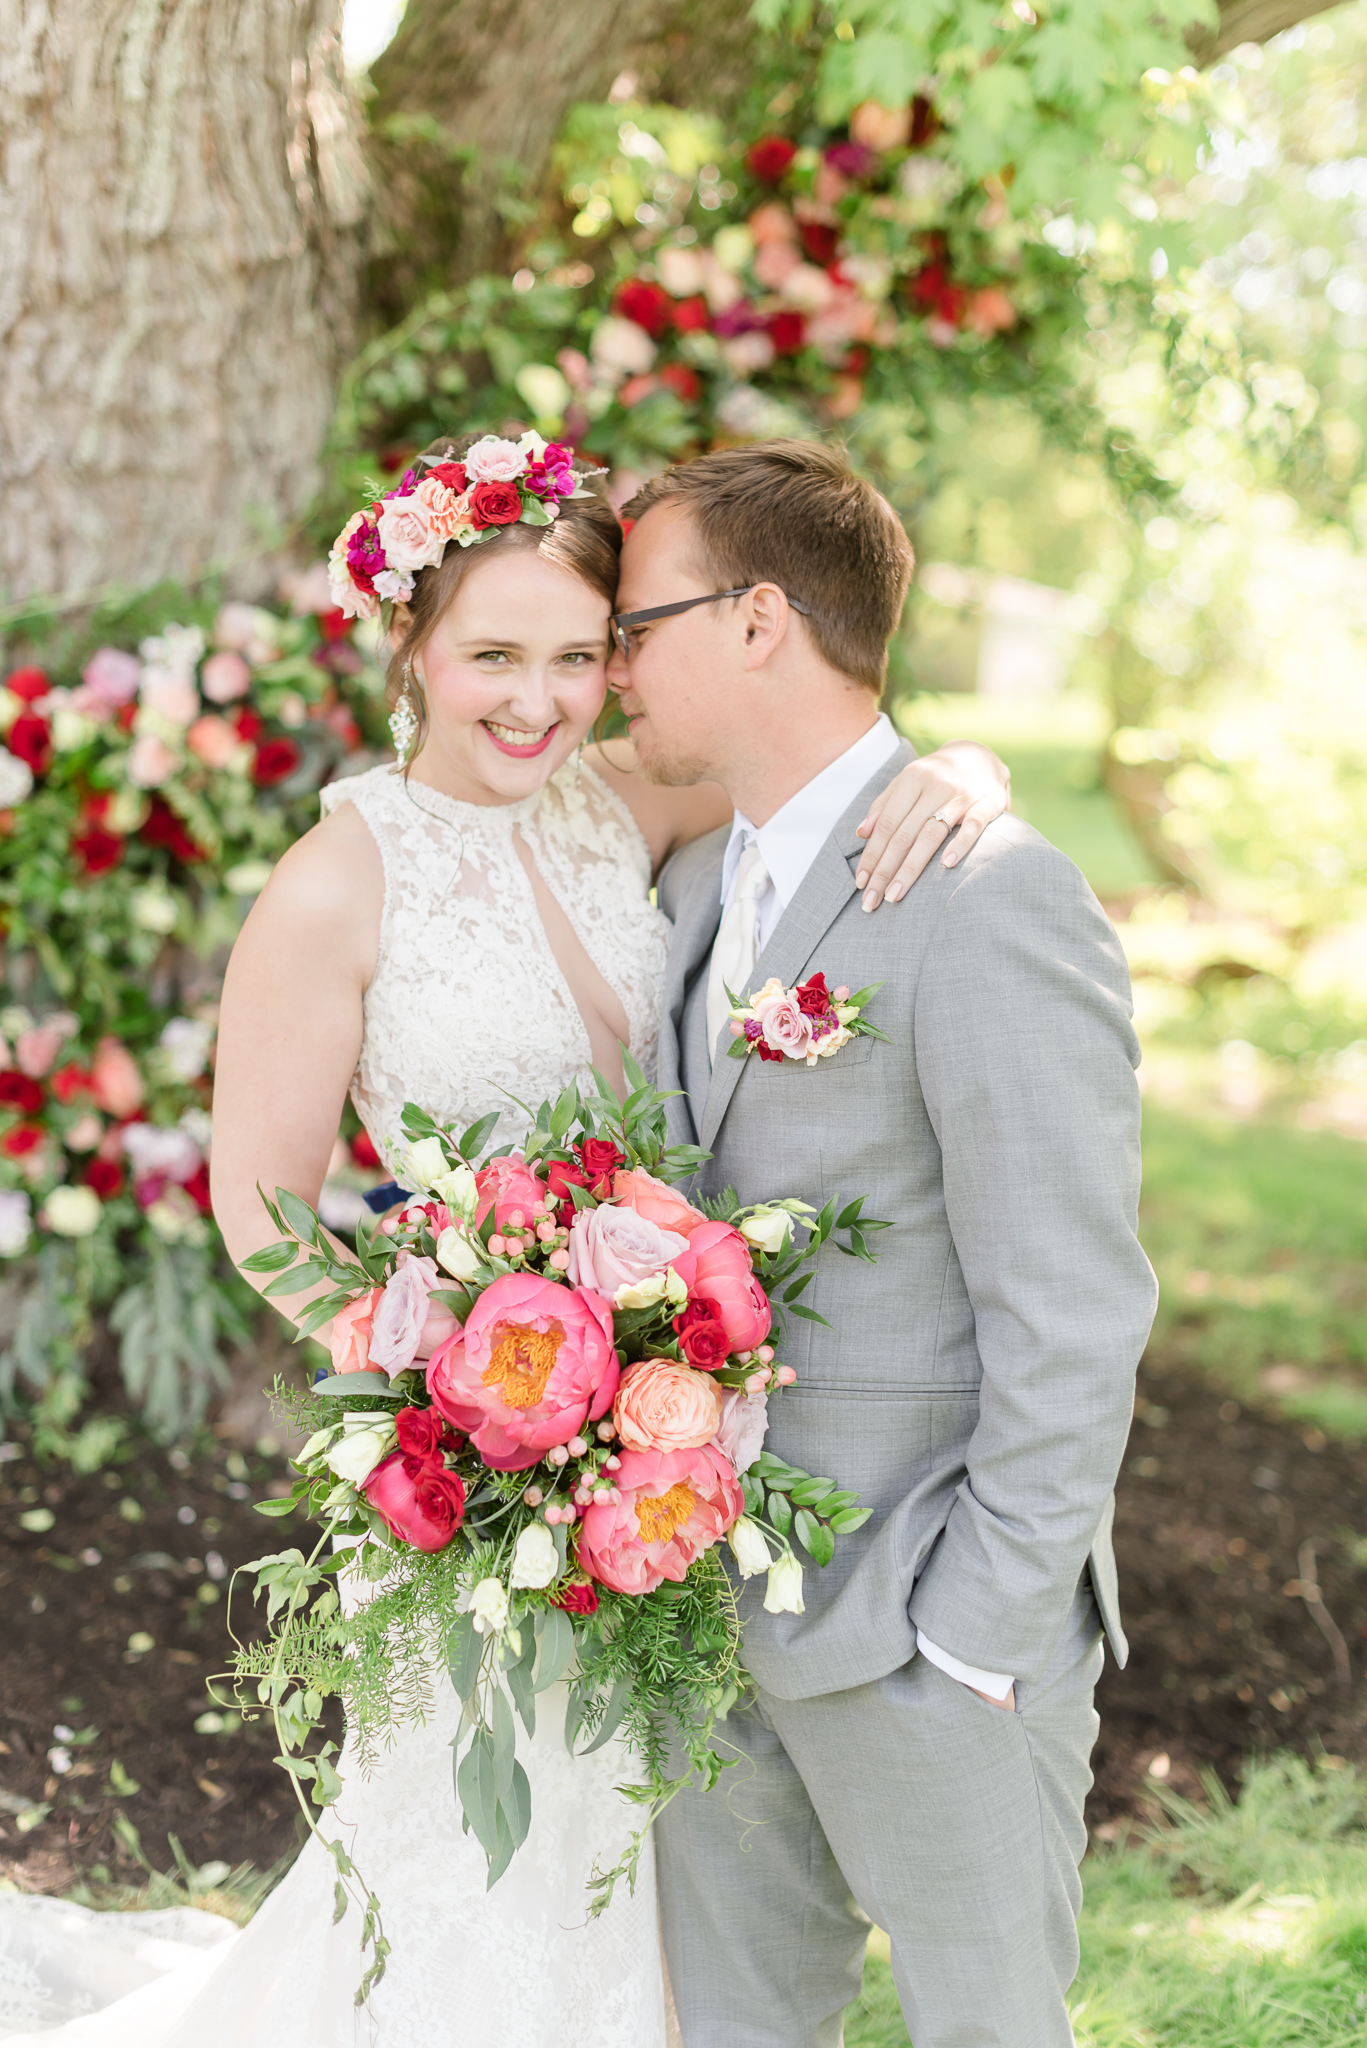 Mustard Seed Gardens Wedding Indianapolis Noblesvile Fishers Wedding Photographer-28.jpg